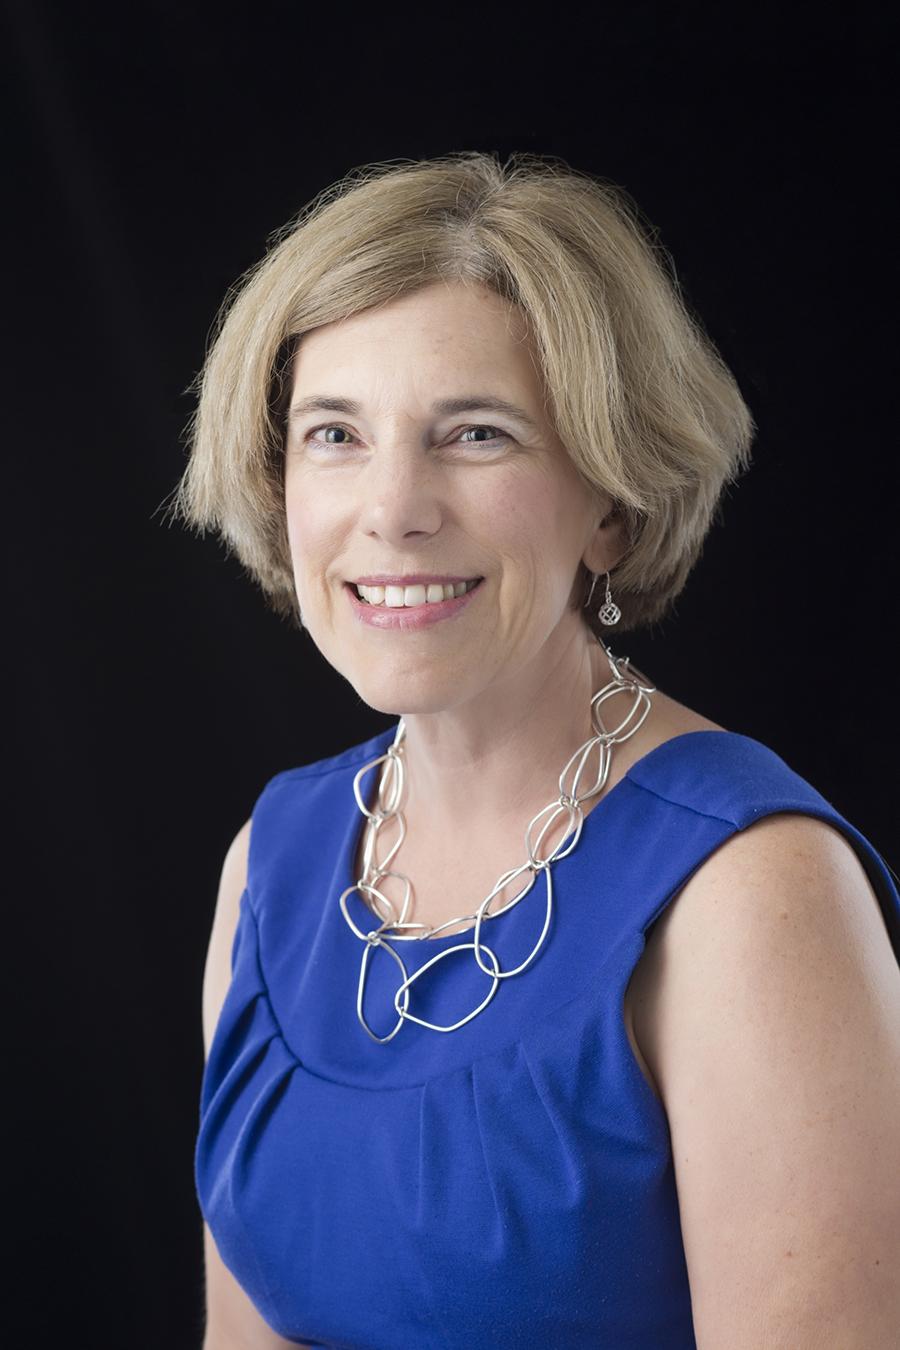 Dana Brackney, PhD, MSN, BSN, RN, CNS